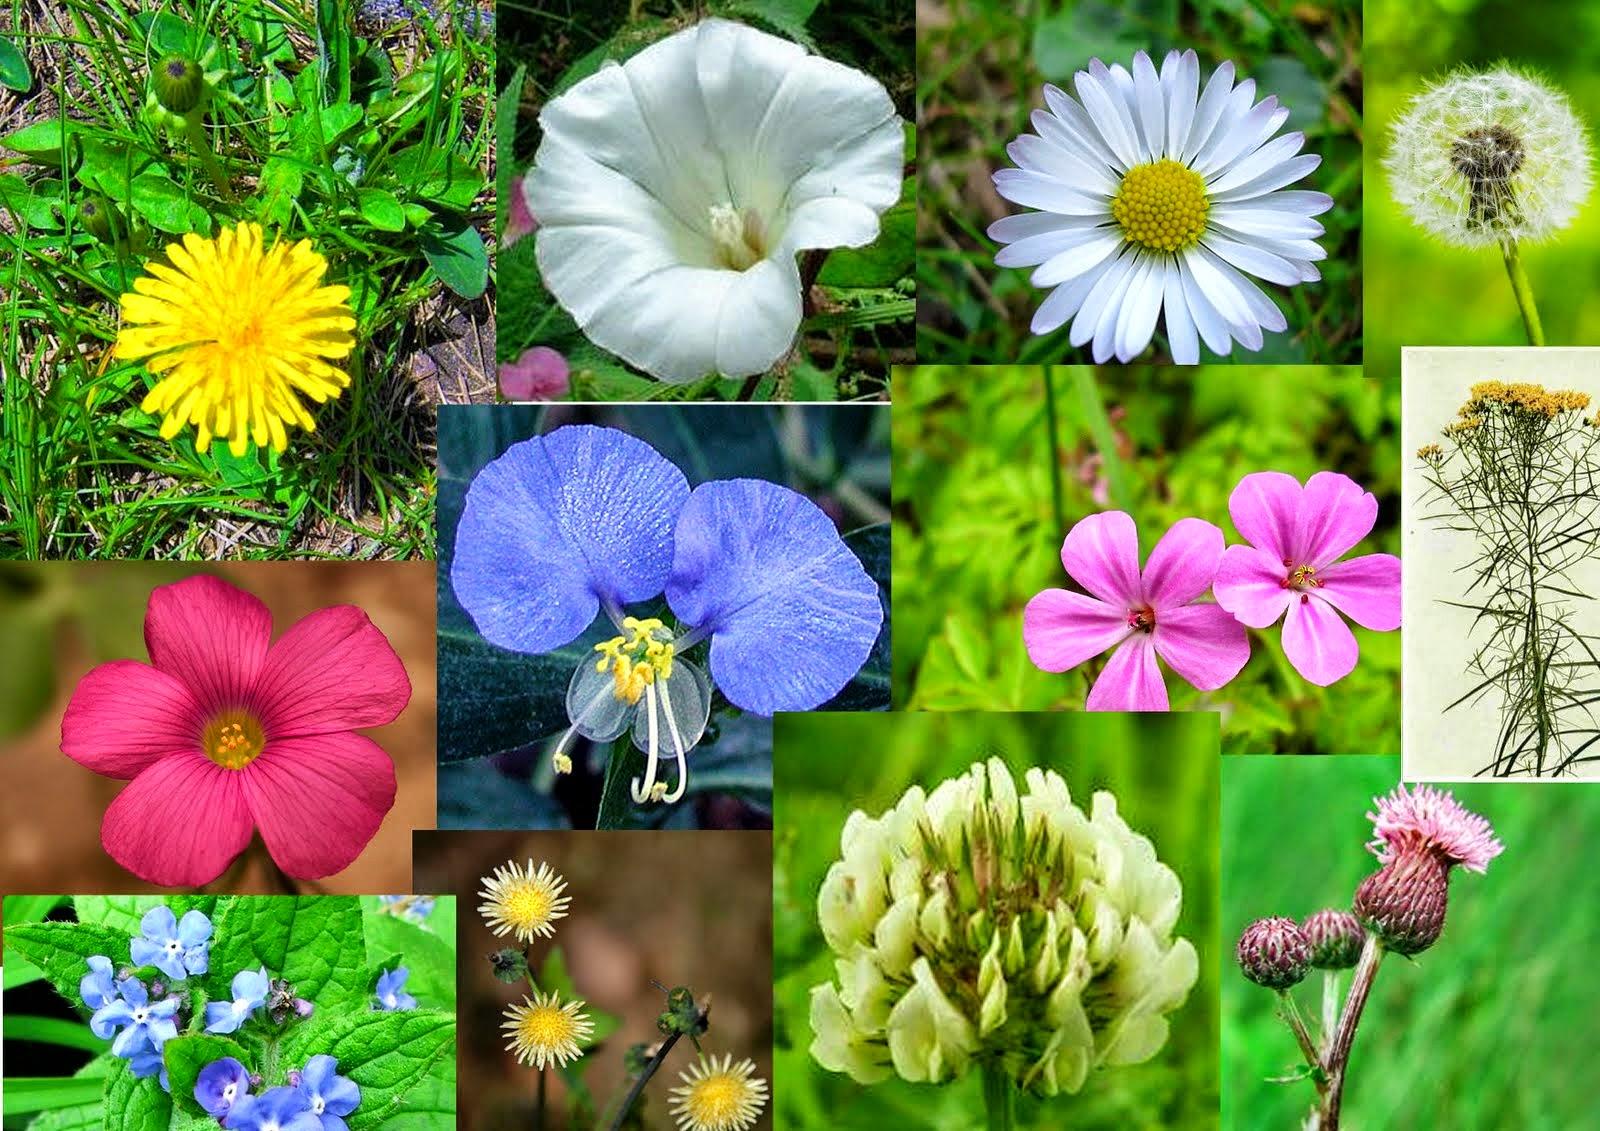 اسم ازهار بالانجليزيِ  Flowers names in English